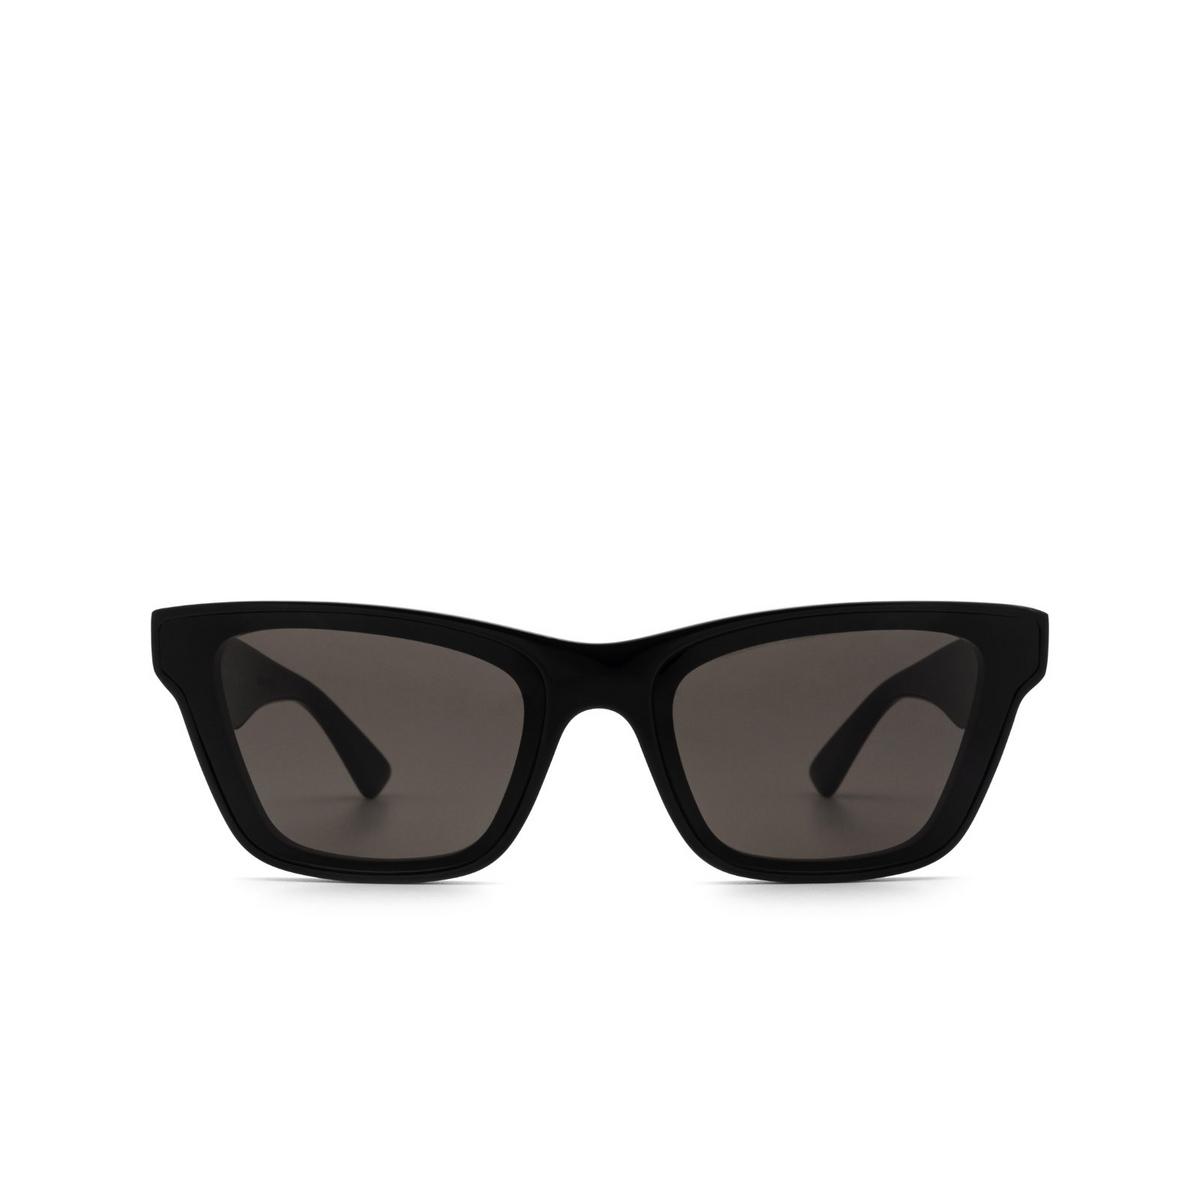 Bottega Veneta® Cat-eye Sunglasses: BV1119S color Black 001 - front view.